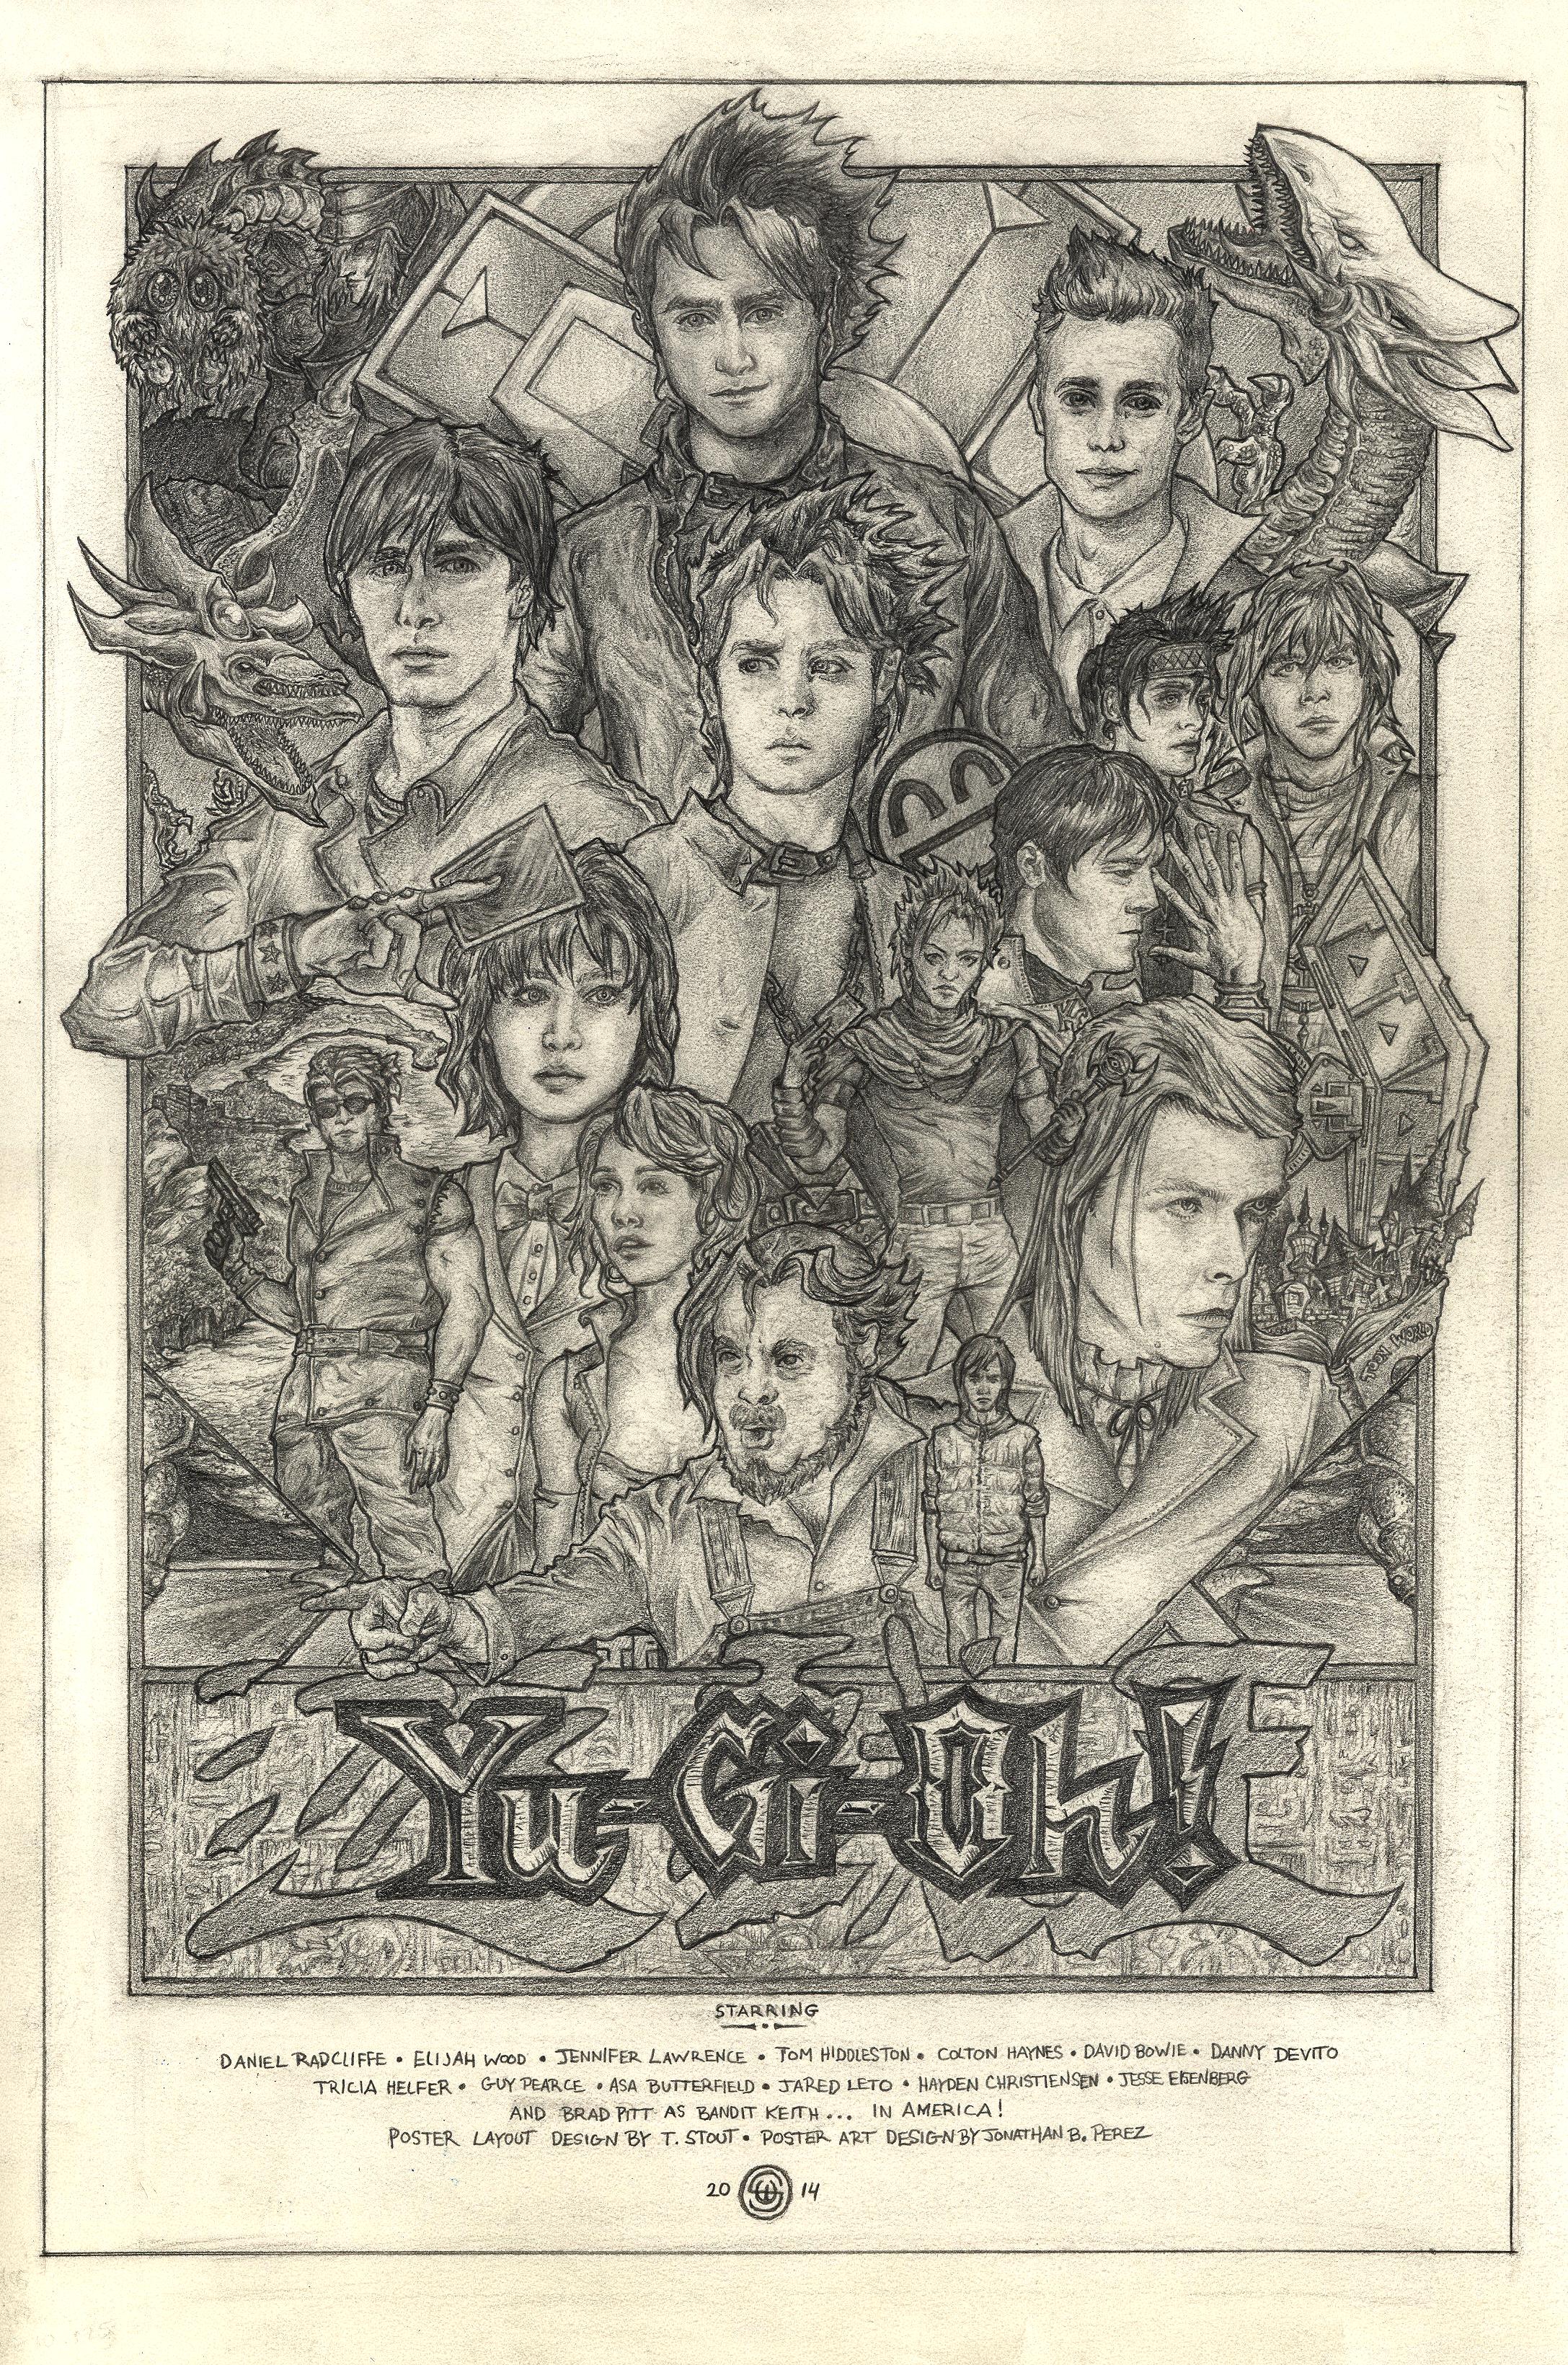 Yu-Gi-Oh! Faux Movie Poster - Fan Art, Film and TV - Jonathan B Perez - cREAtive Castle Studios.png